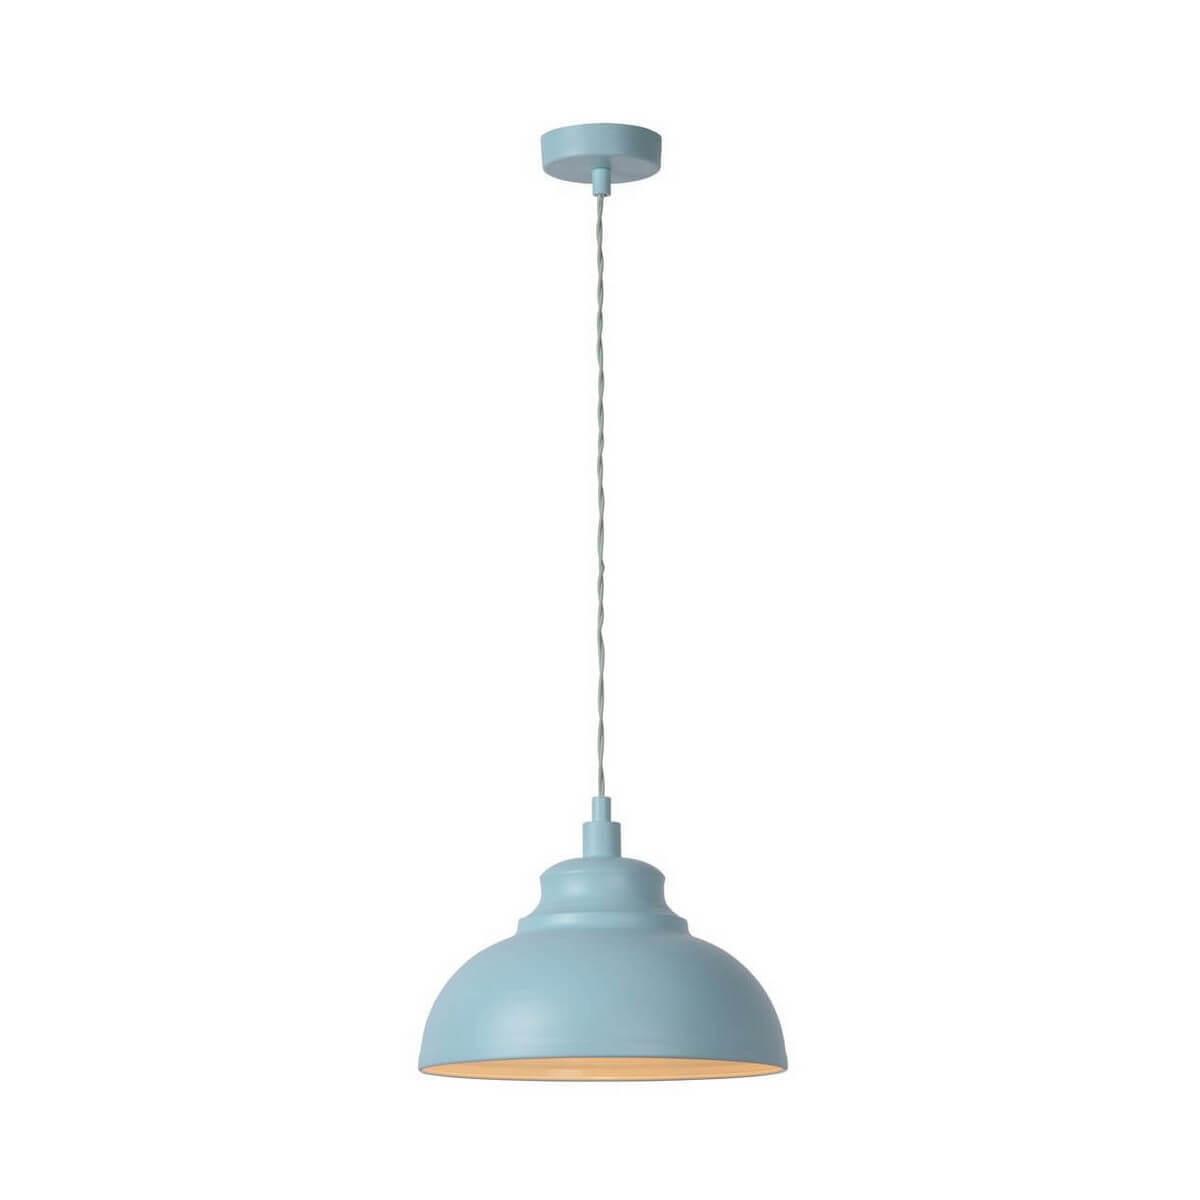 Подвесной светильник Lucide Isla 34400/29/68 цена и фото